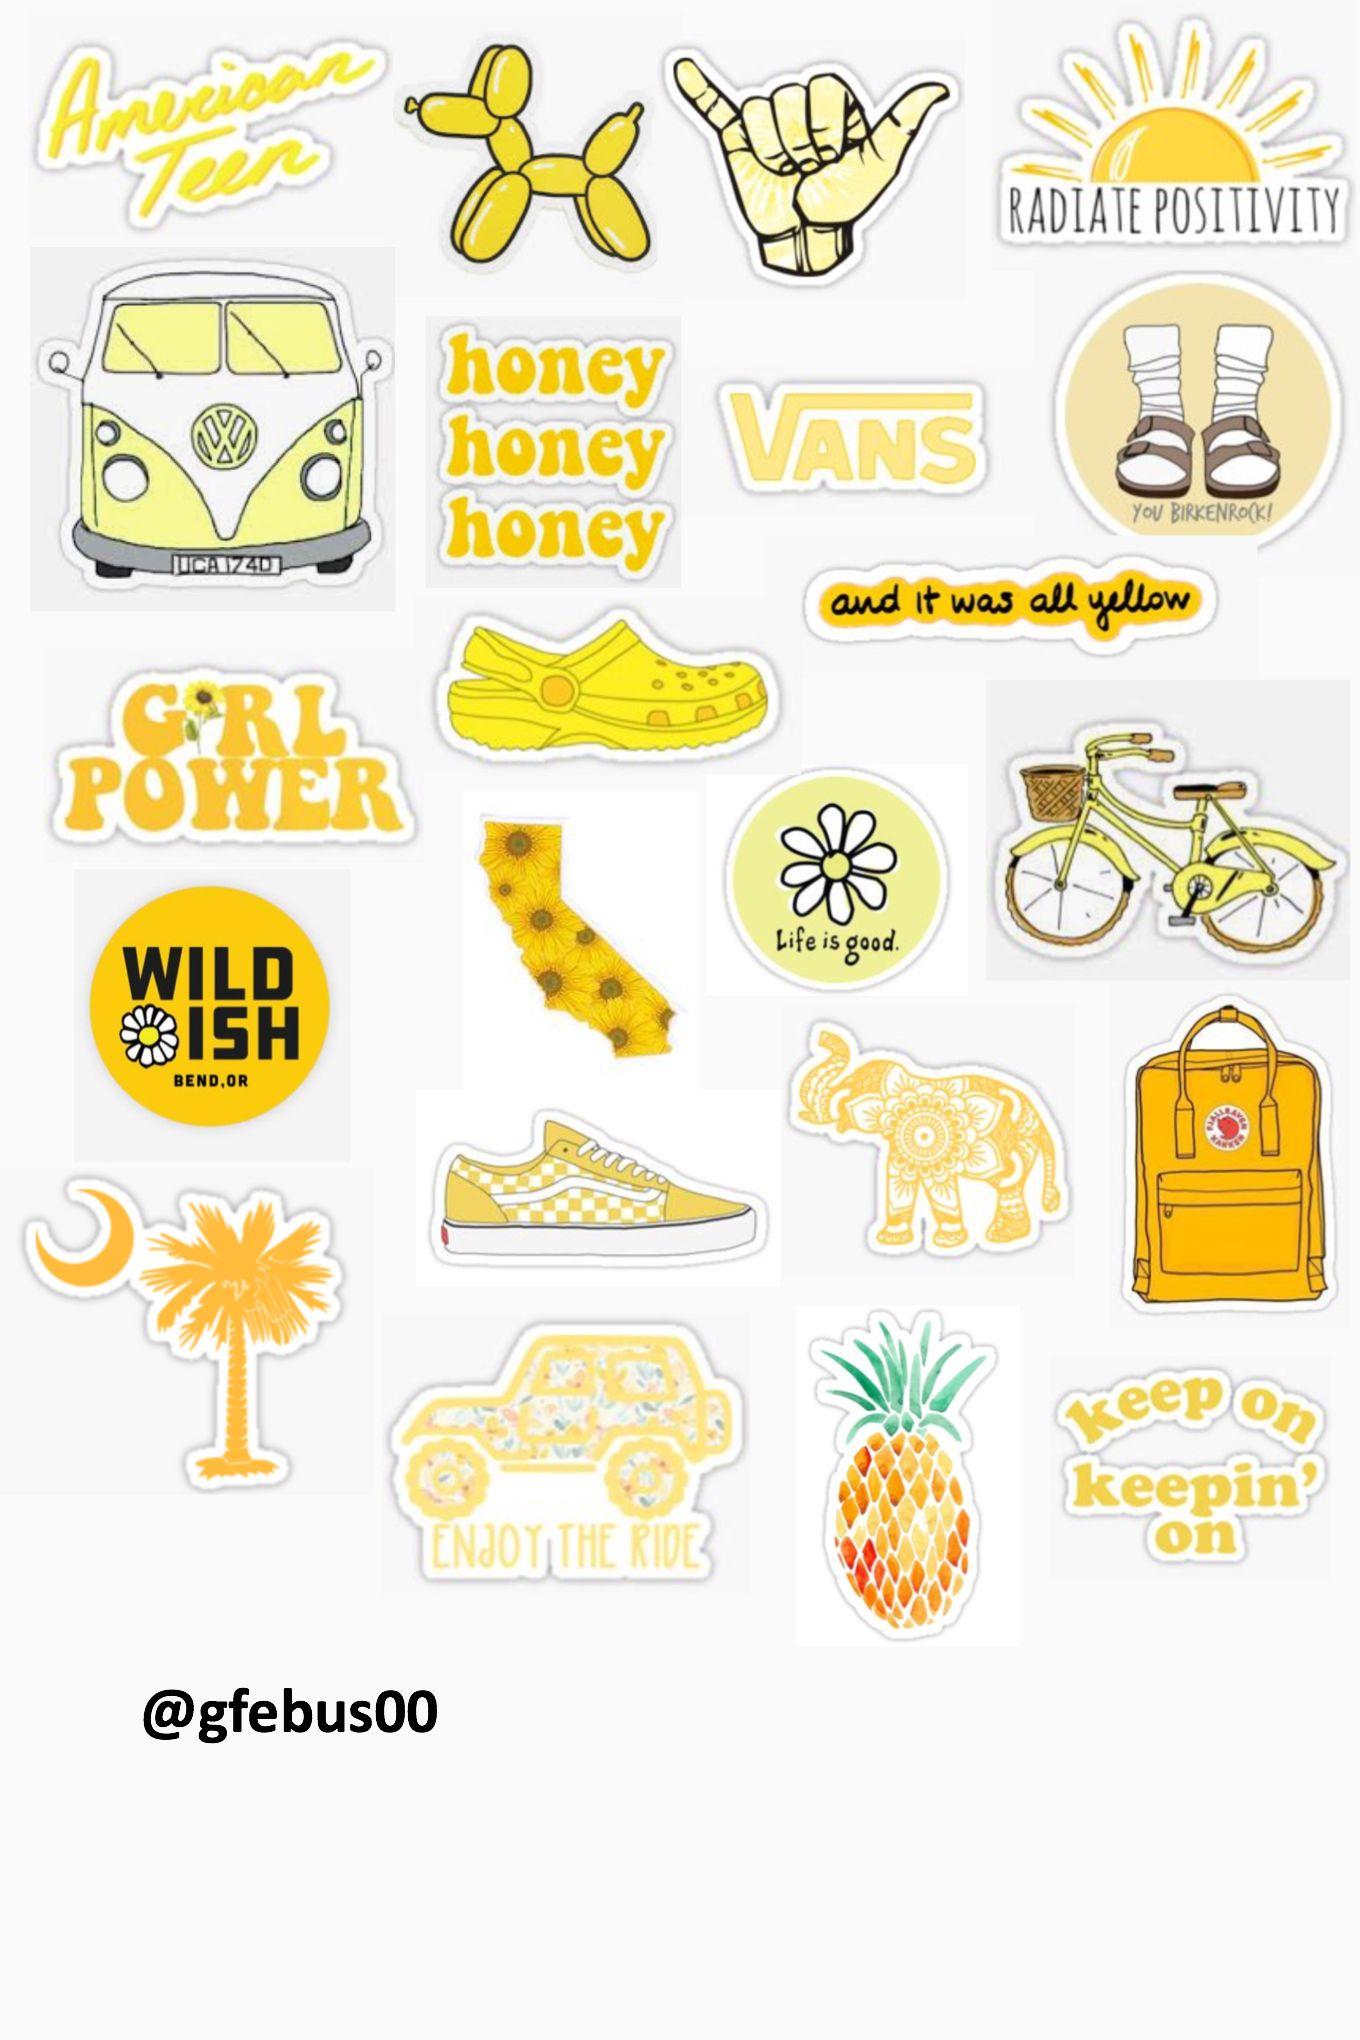 VSCO celiahartshorn random in 2019 t Phone stickers